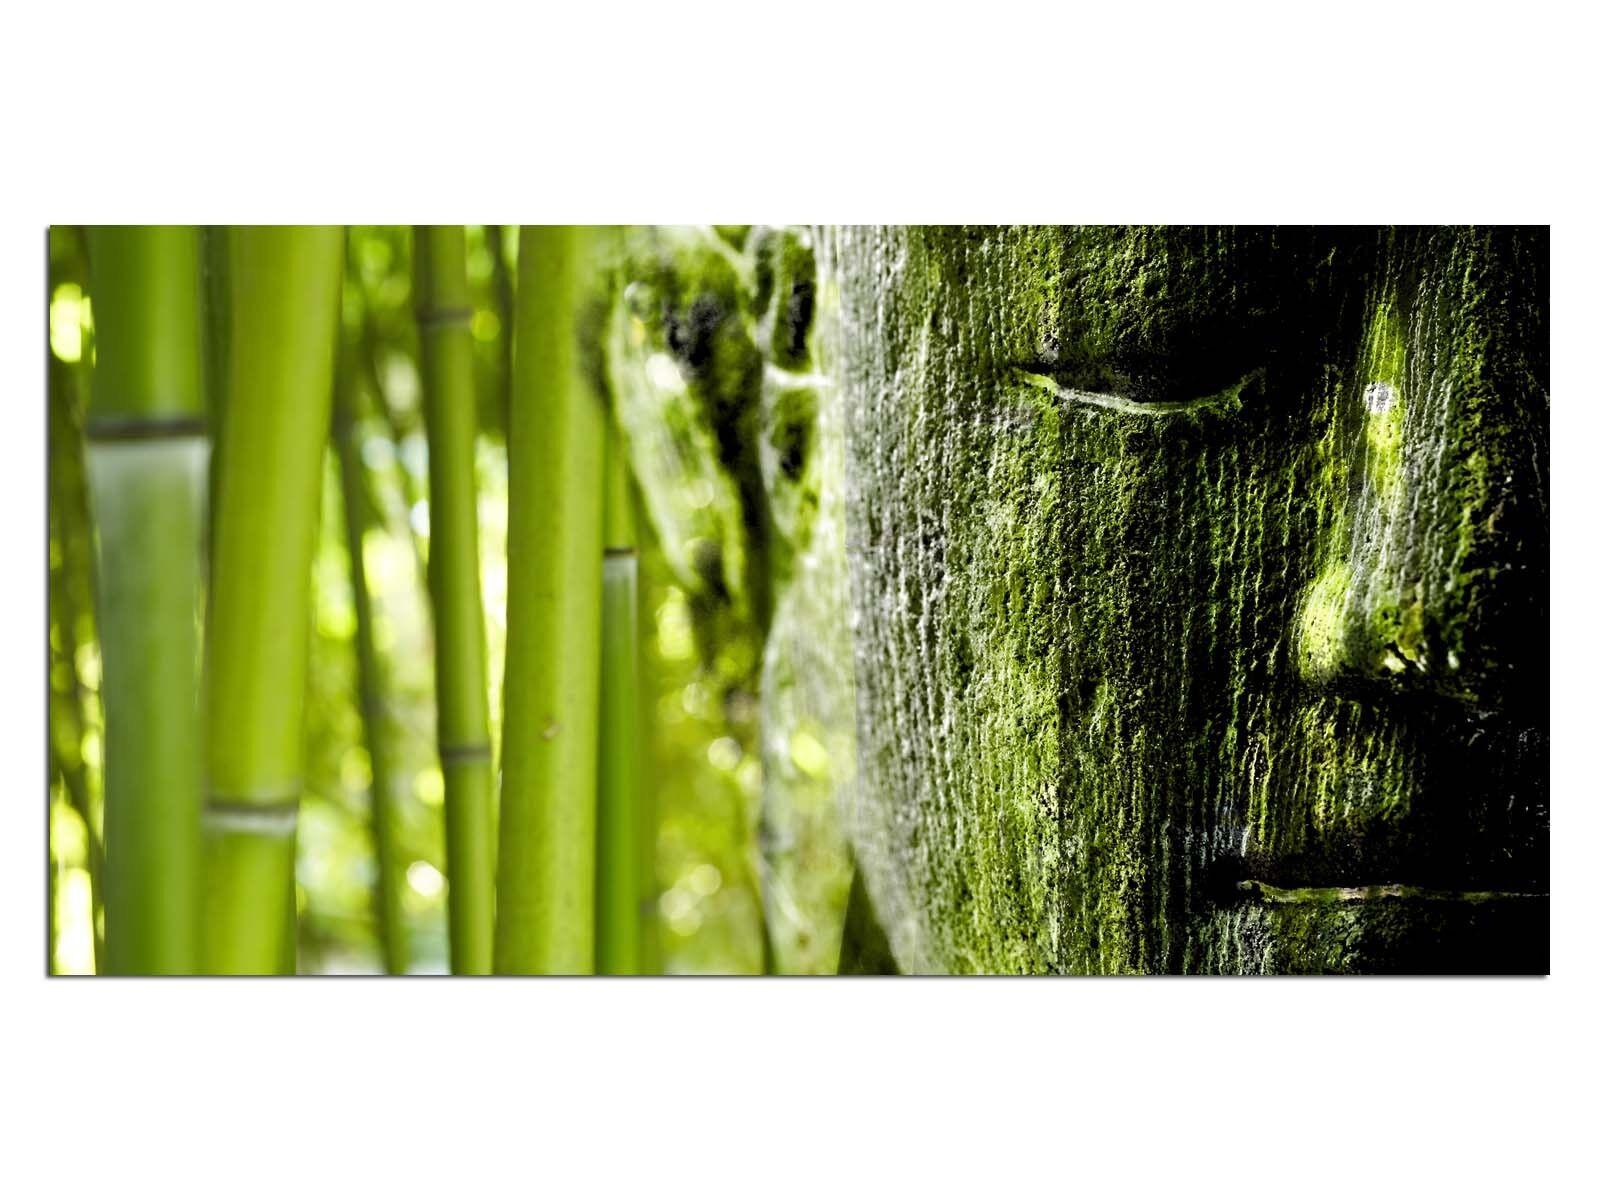 Deco De Vidrio Imagen eg4100500641 Bambú Buddah verde Tamaño 39,37  X 19,68  Hd prin